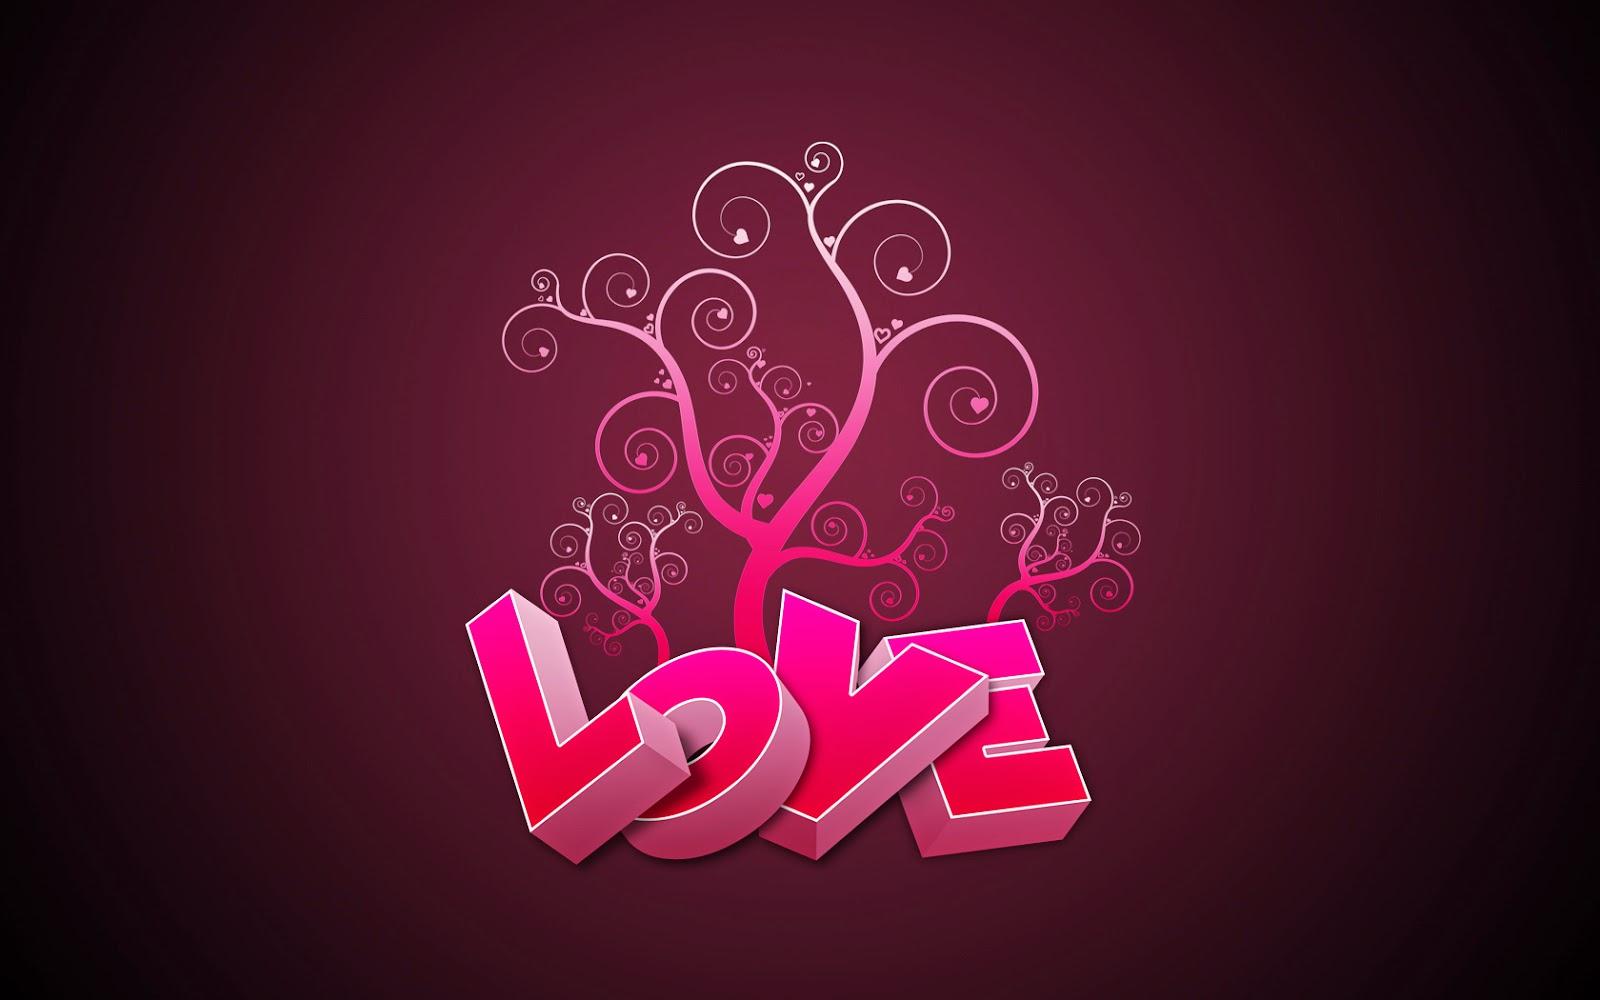 Love Images Hd Desktop : Love HD desktop wallpaper Picture Gallery